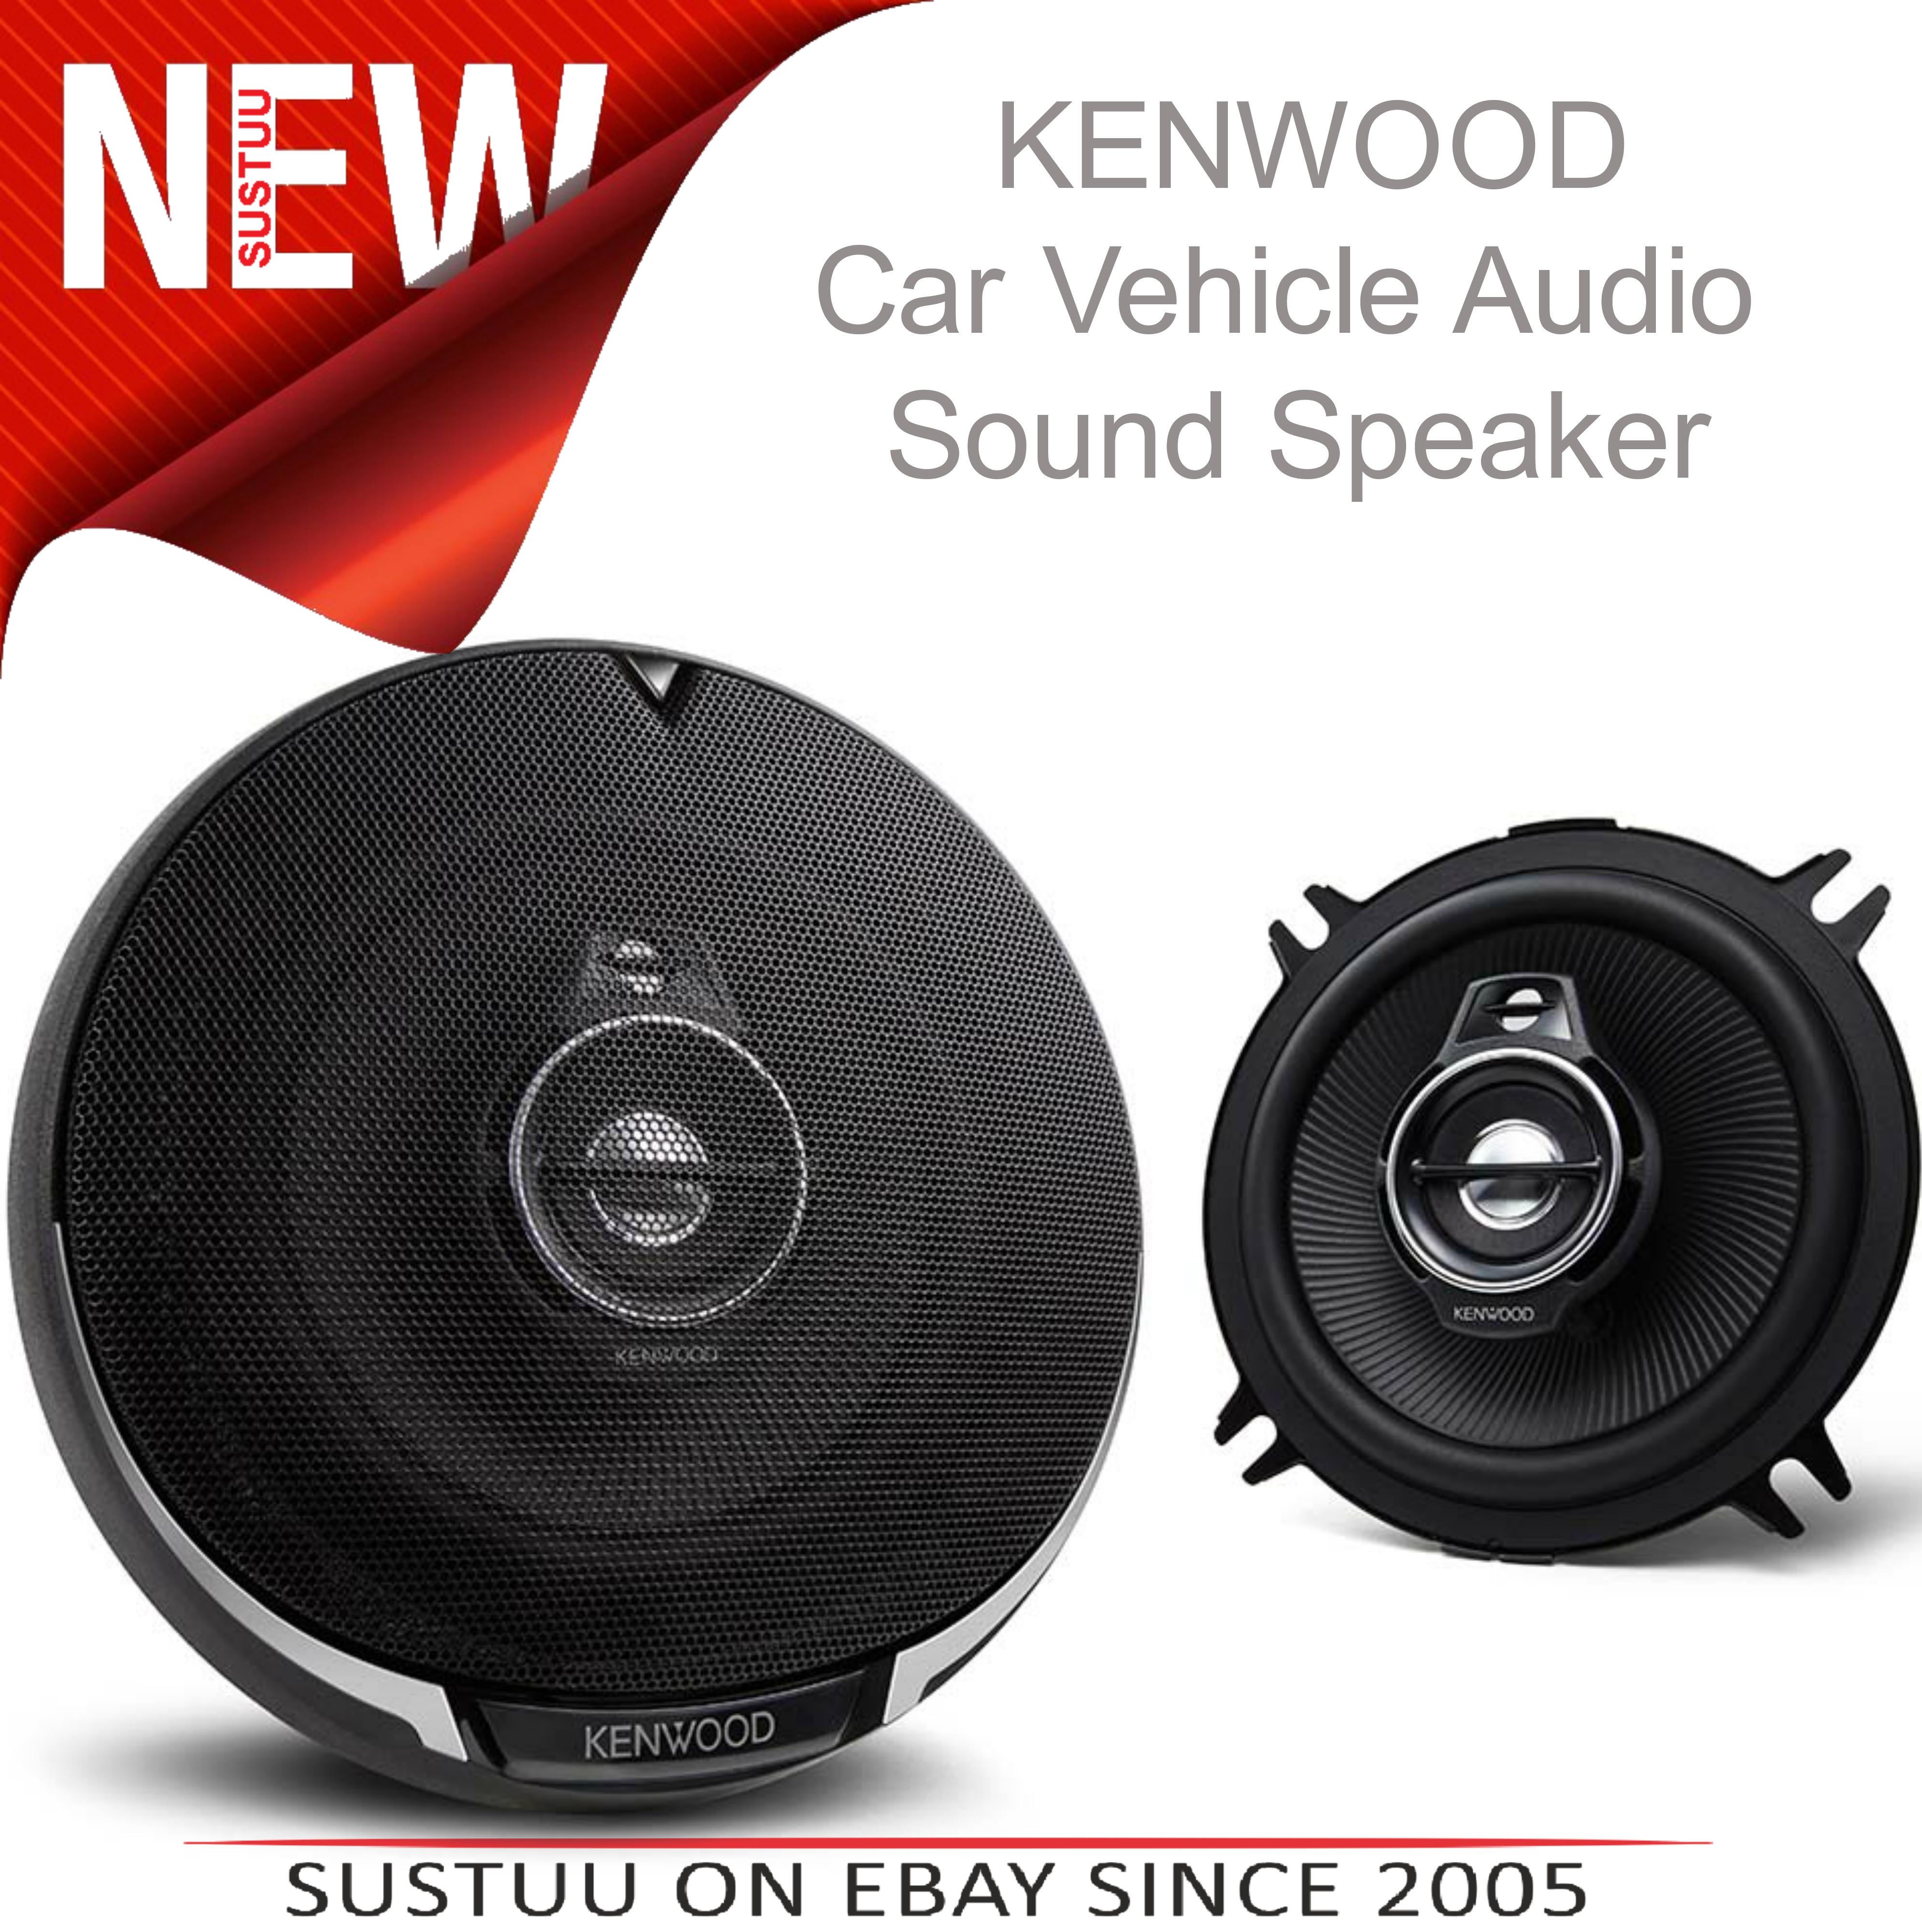 KENWOOD KFC PS1395 130mm 3 Way In Car Vehicle Audio Sound Speaker